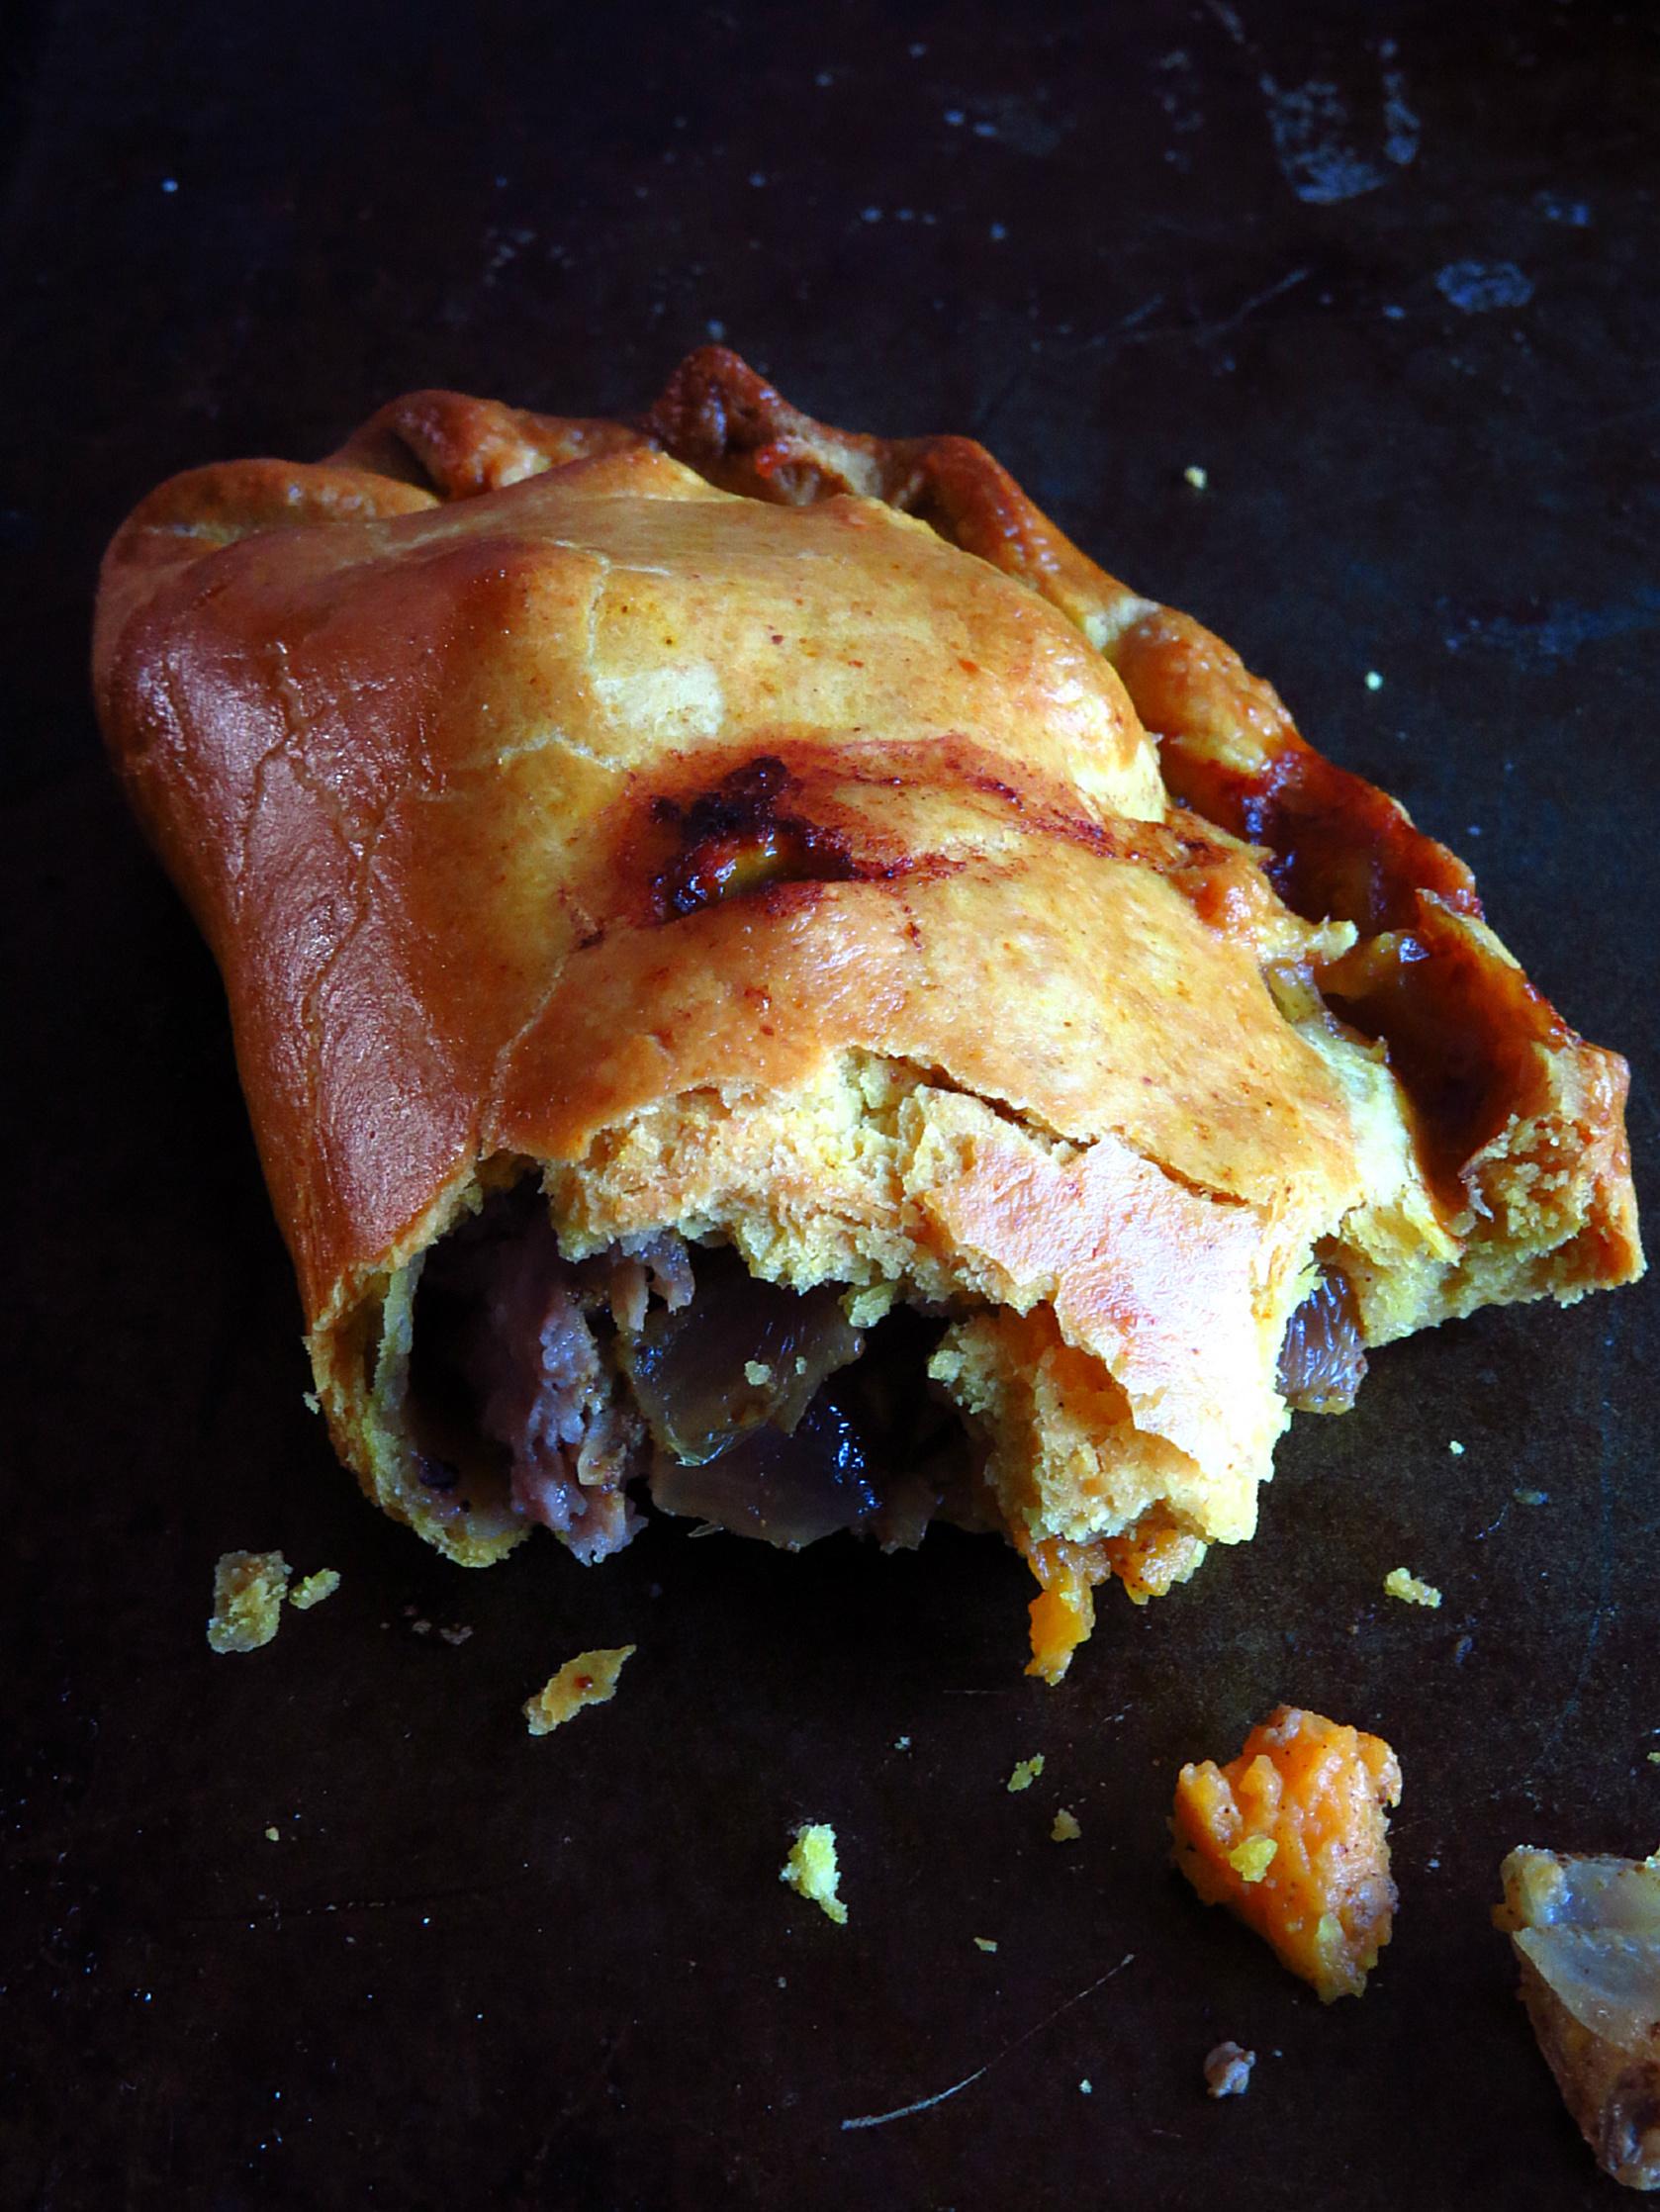 Eaten Cornish pasty